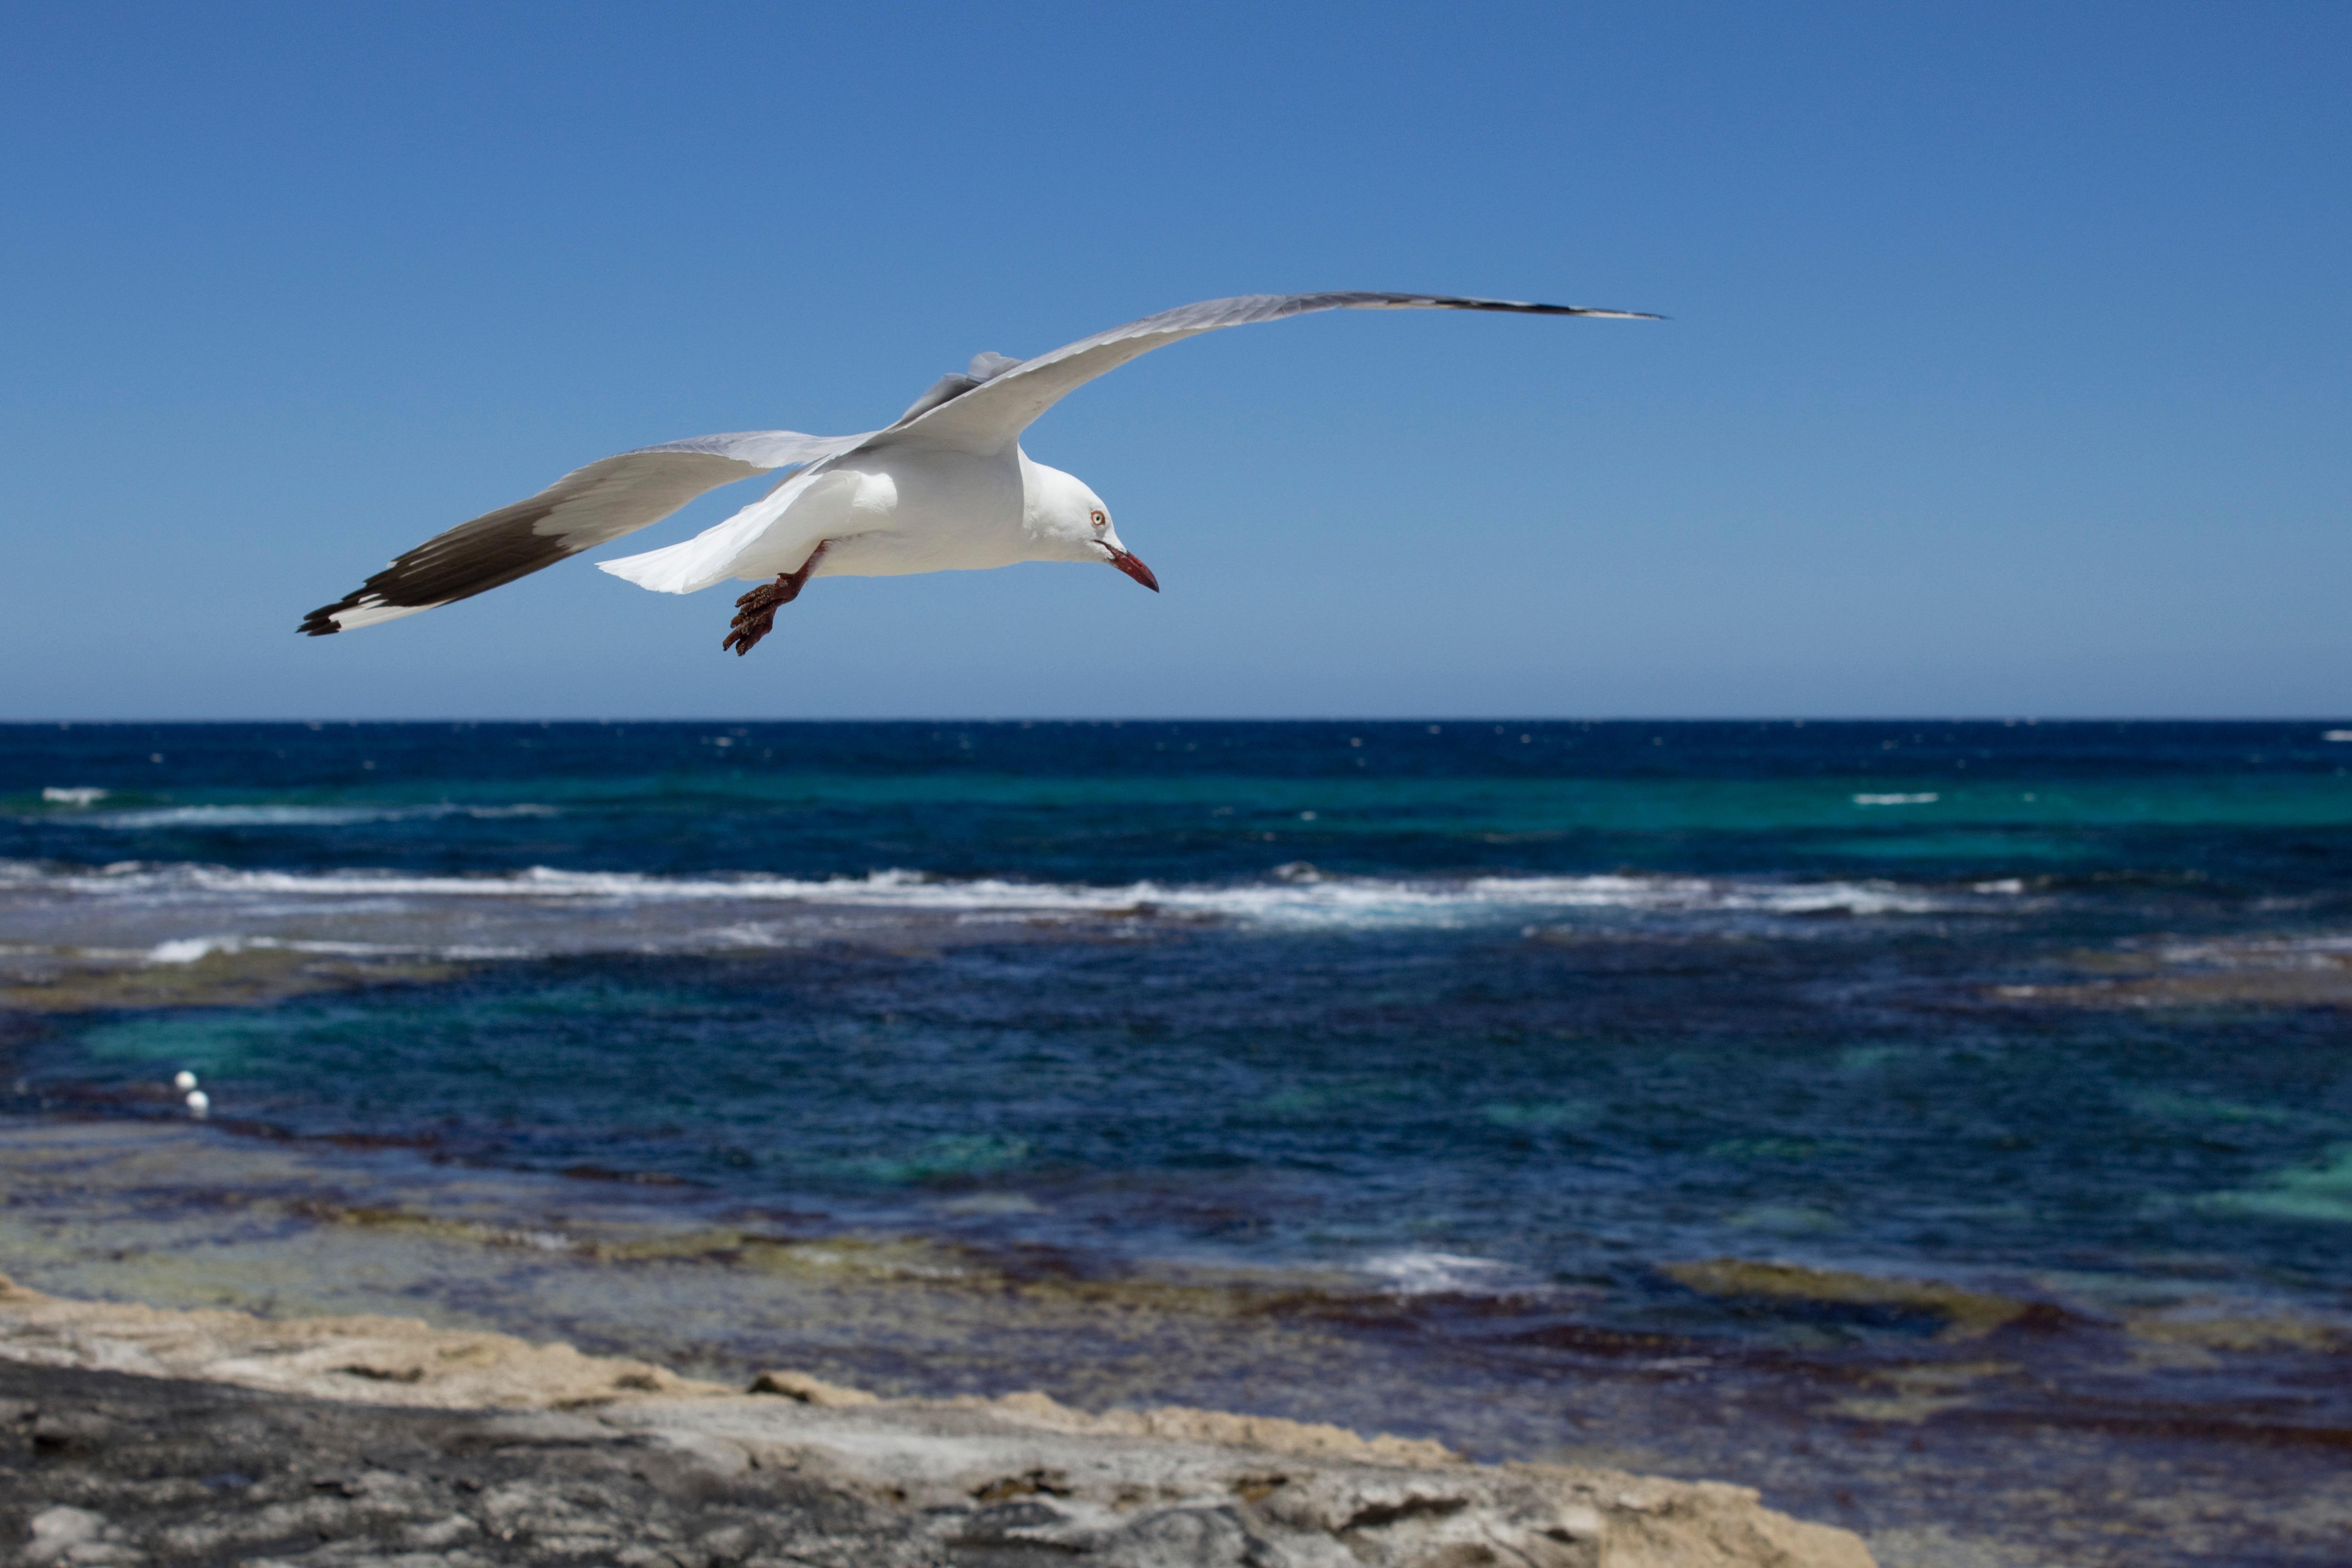 Красивое фото моря с чайками